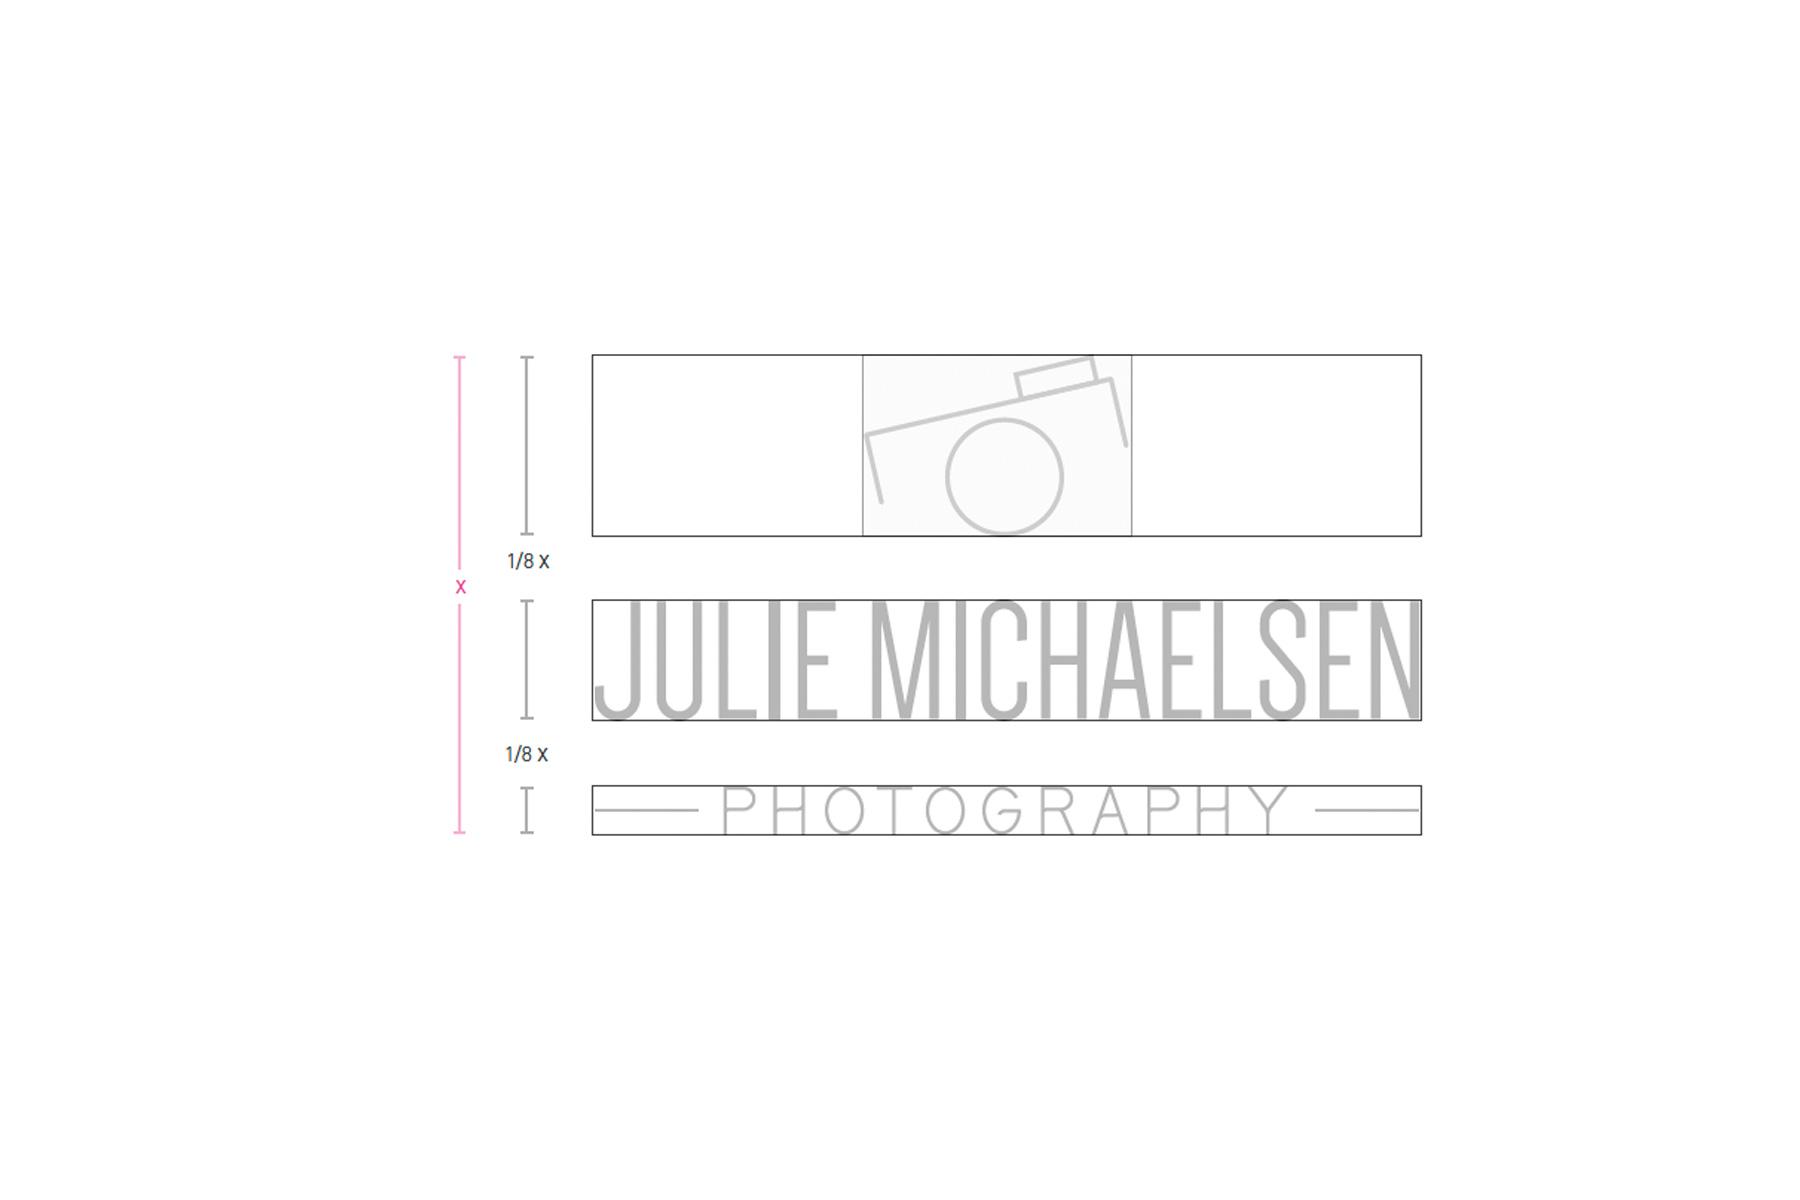 julie-michaelsen-photography-4.jpg